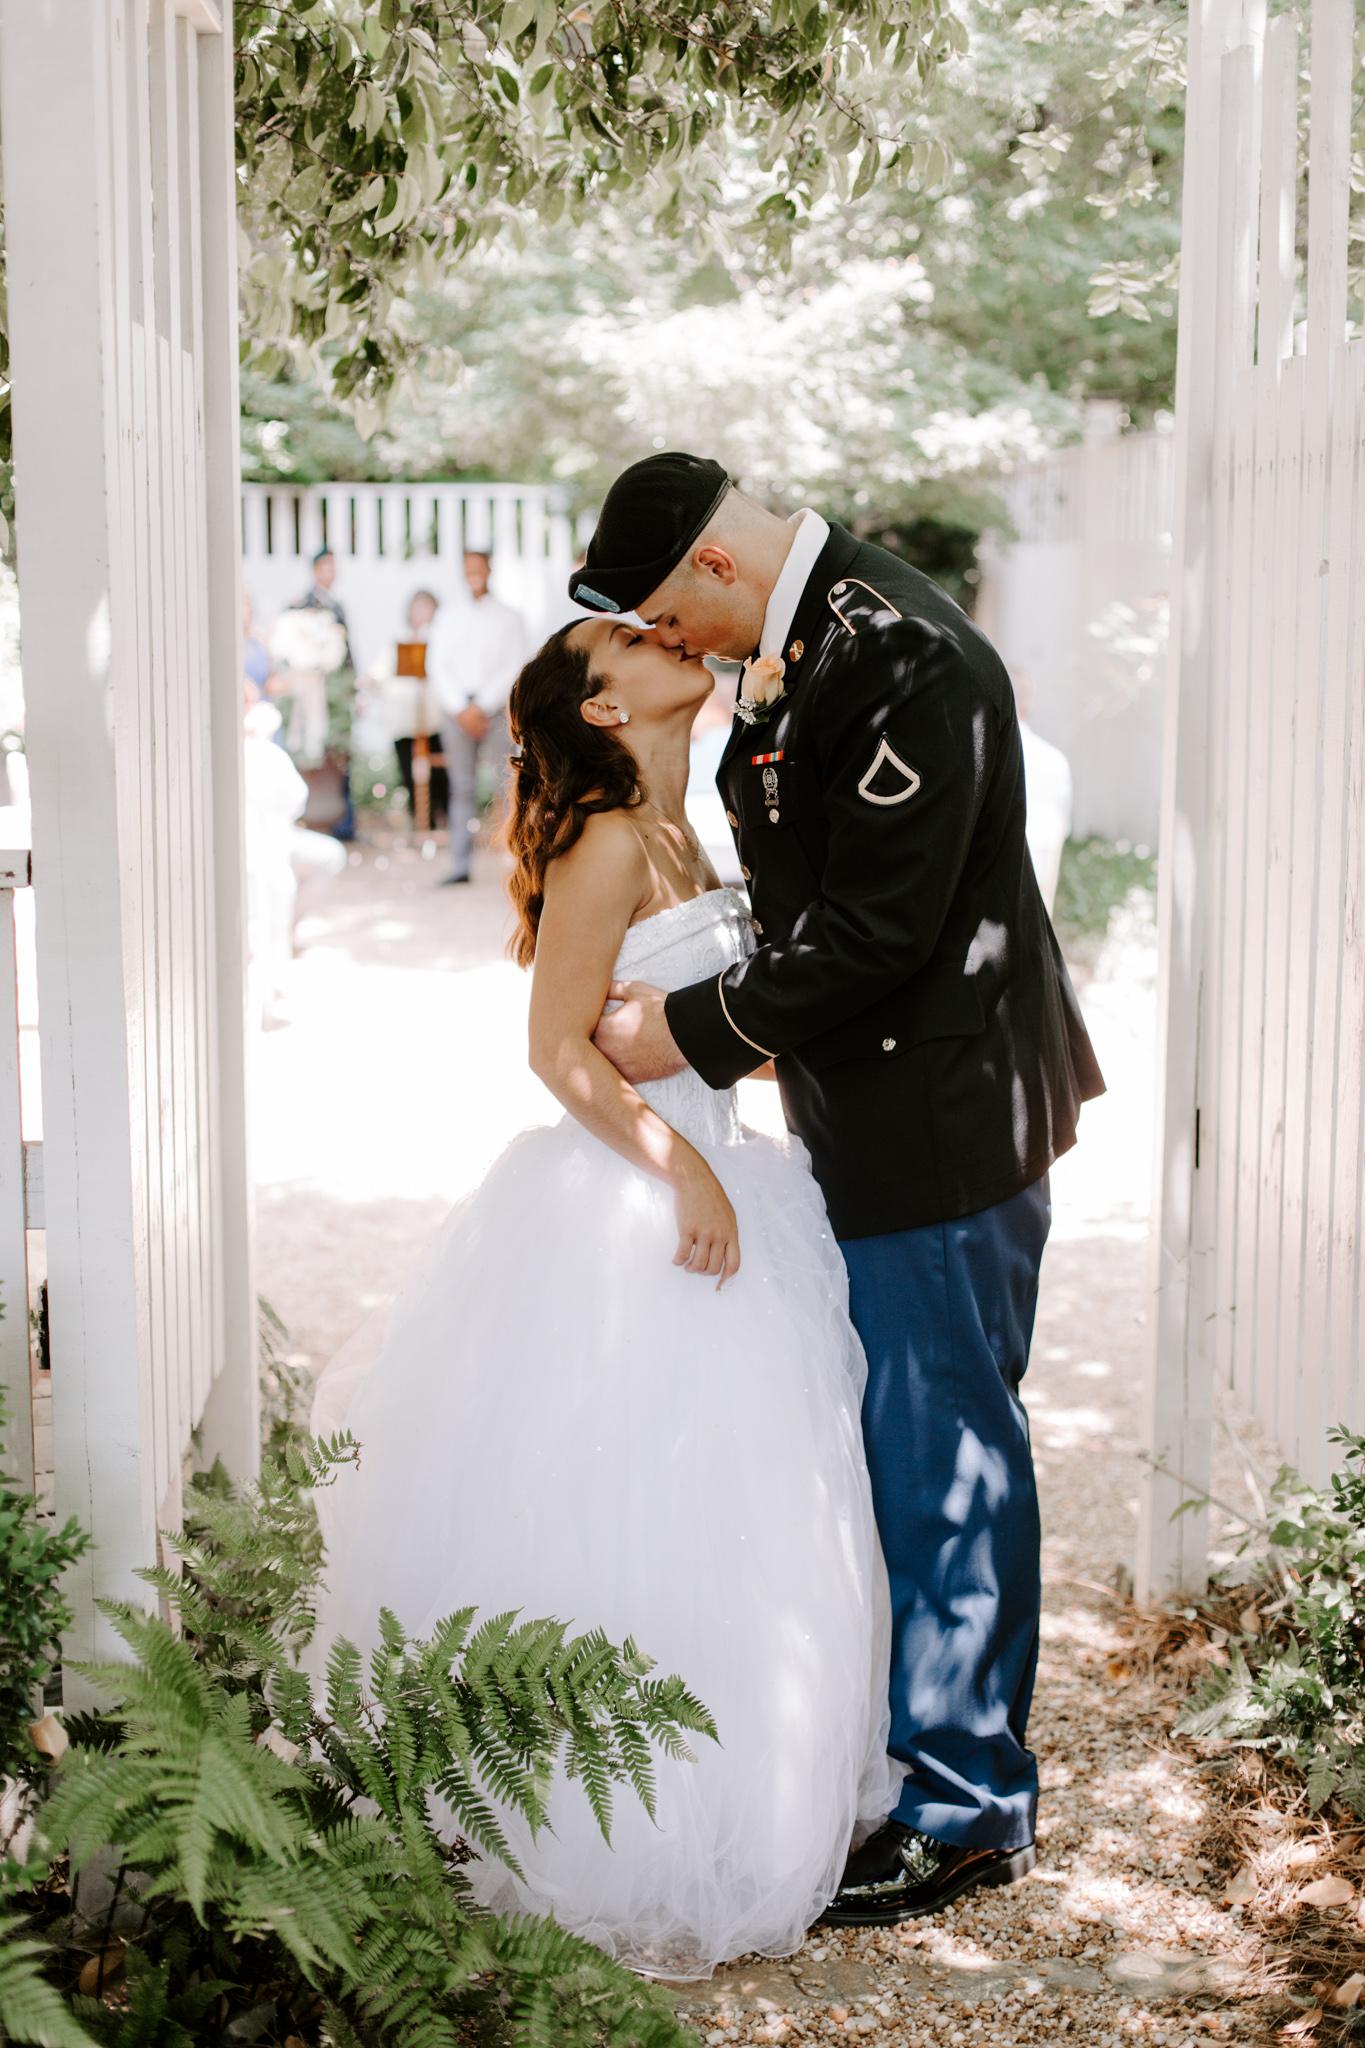 Brittany Martorella | Olympia Washington Wedding Photographer